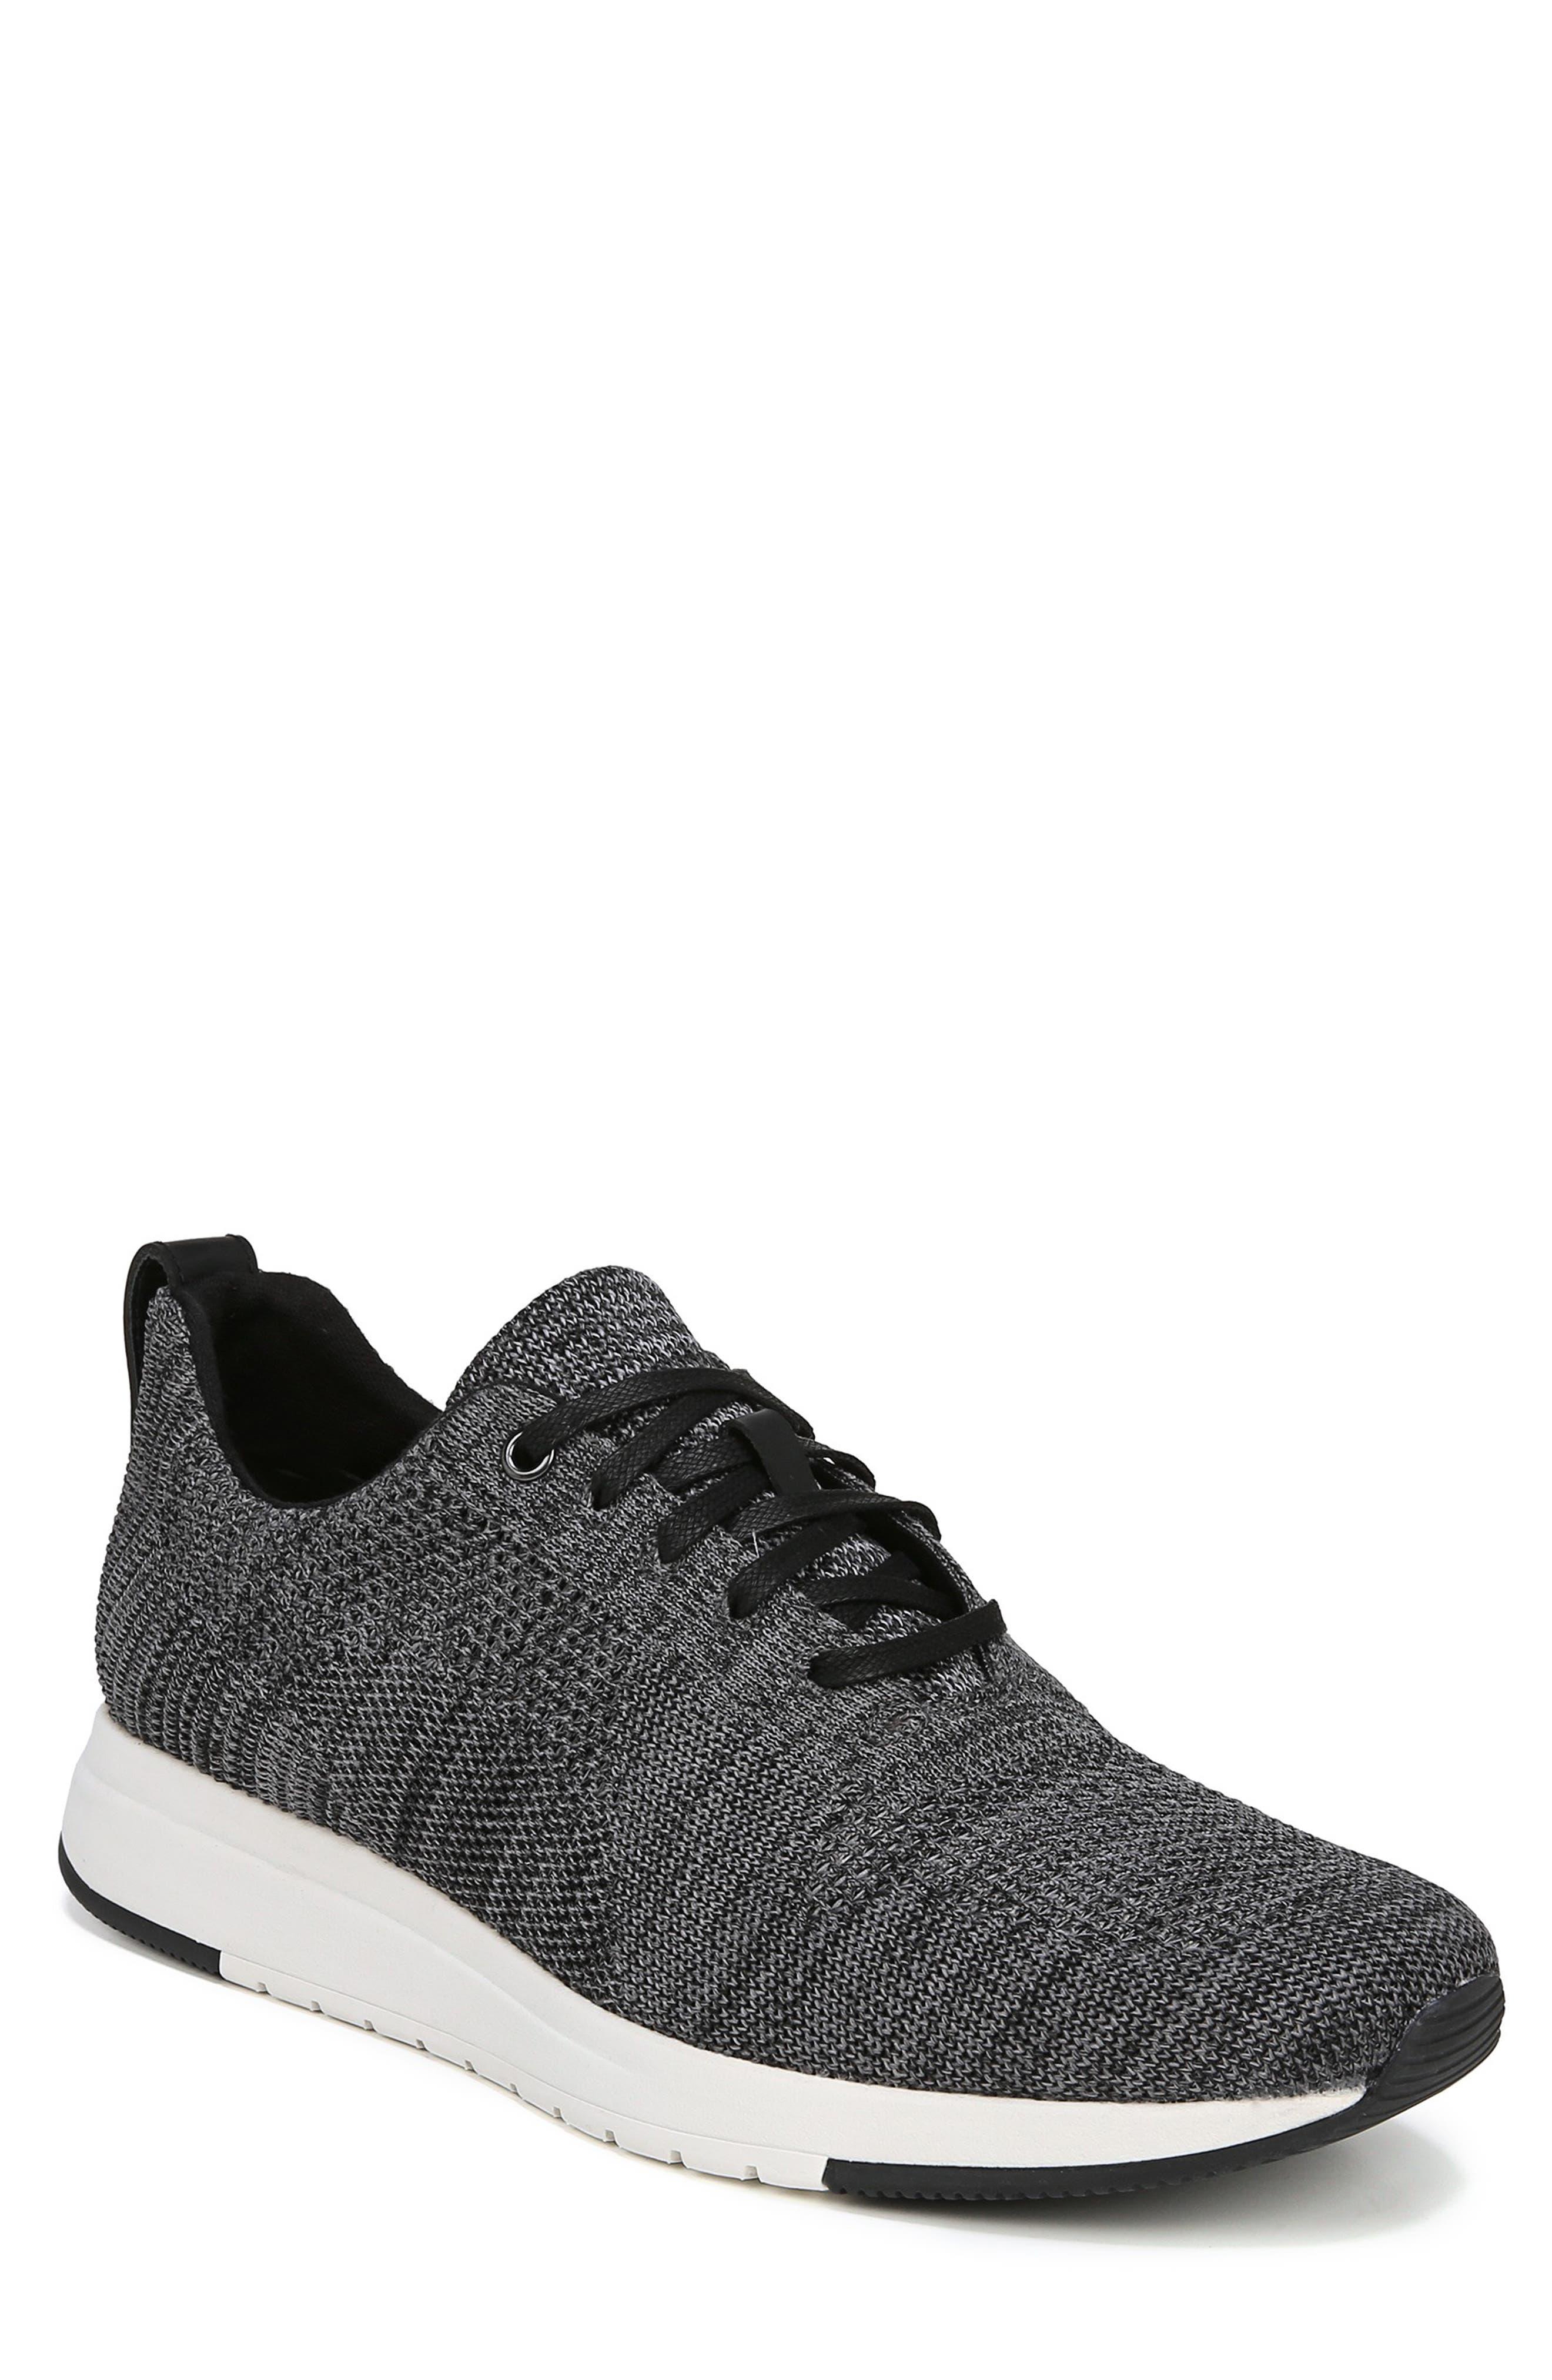 Palo Knit Sneaker,                         Main,                         color, MARL GREY/ BLACK